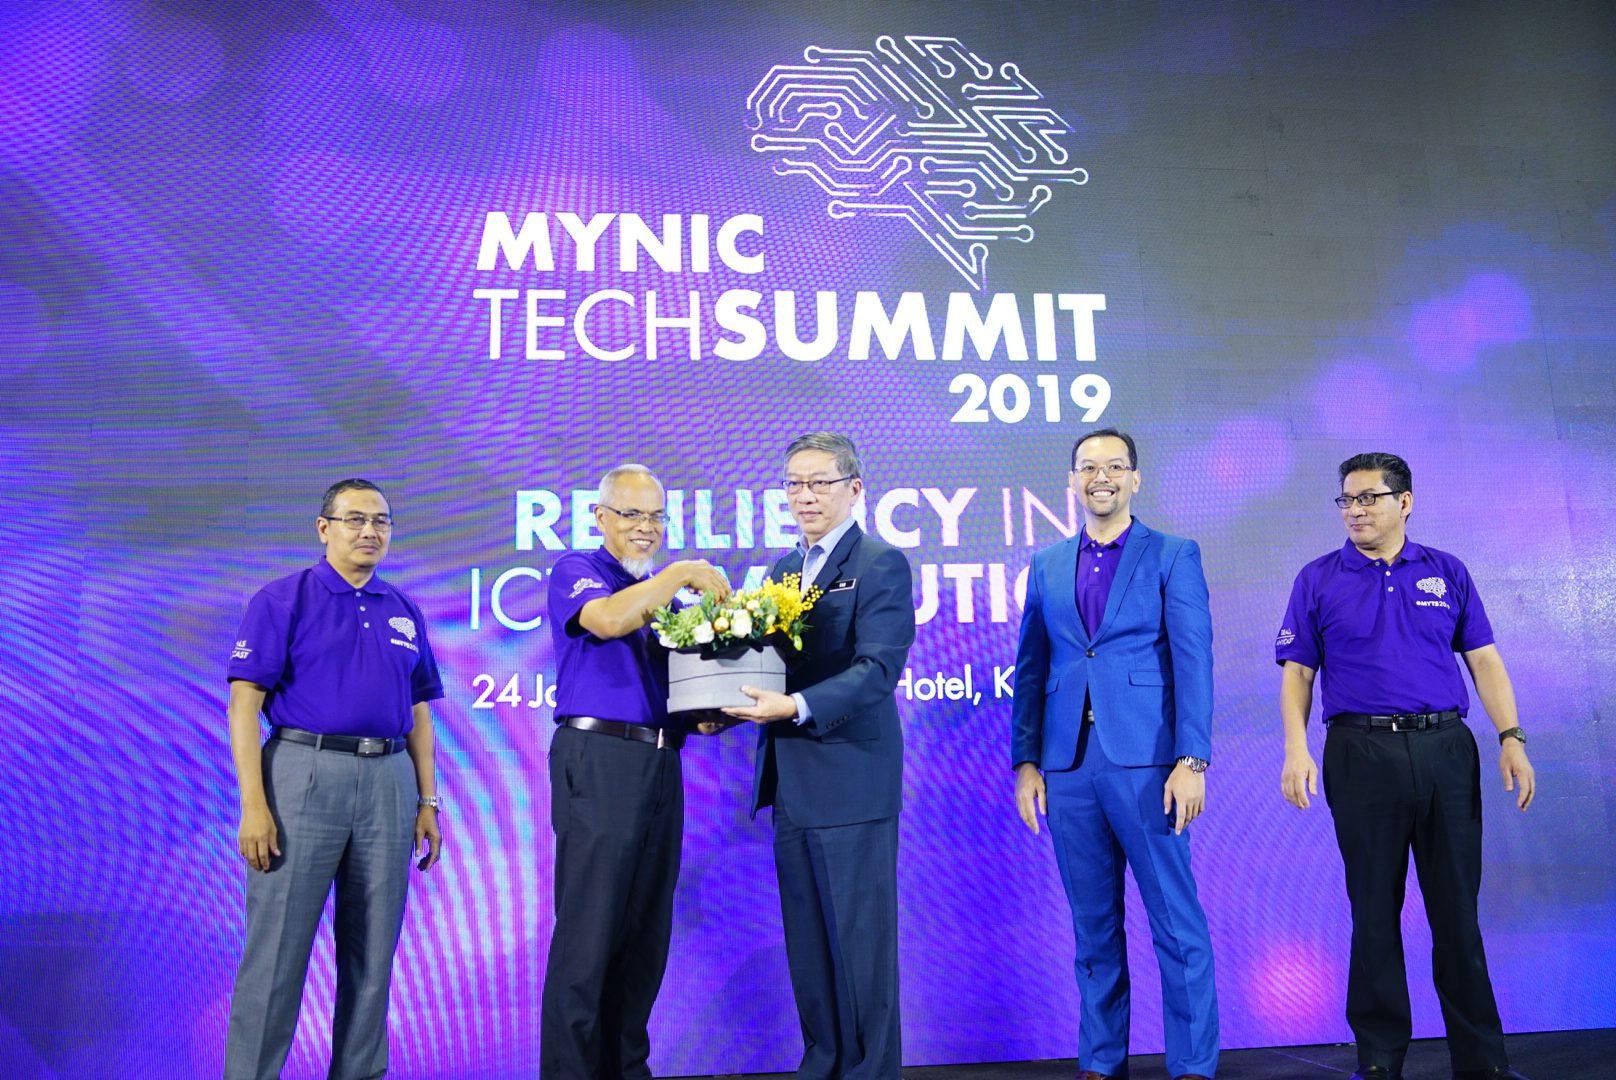 MYNIC Tech Summit 2019